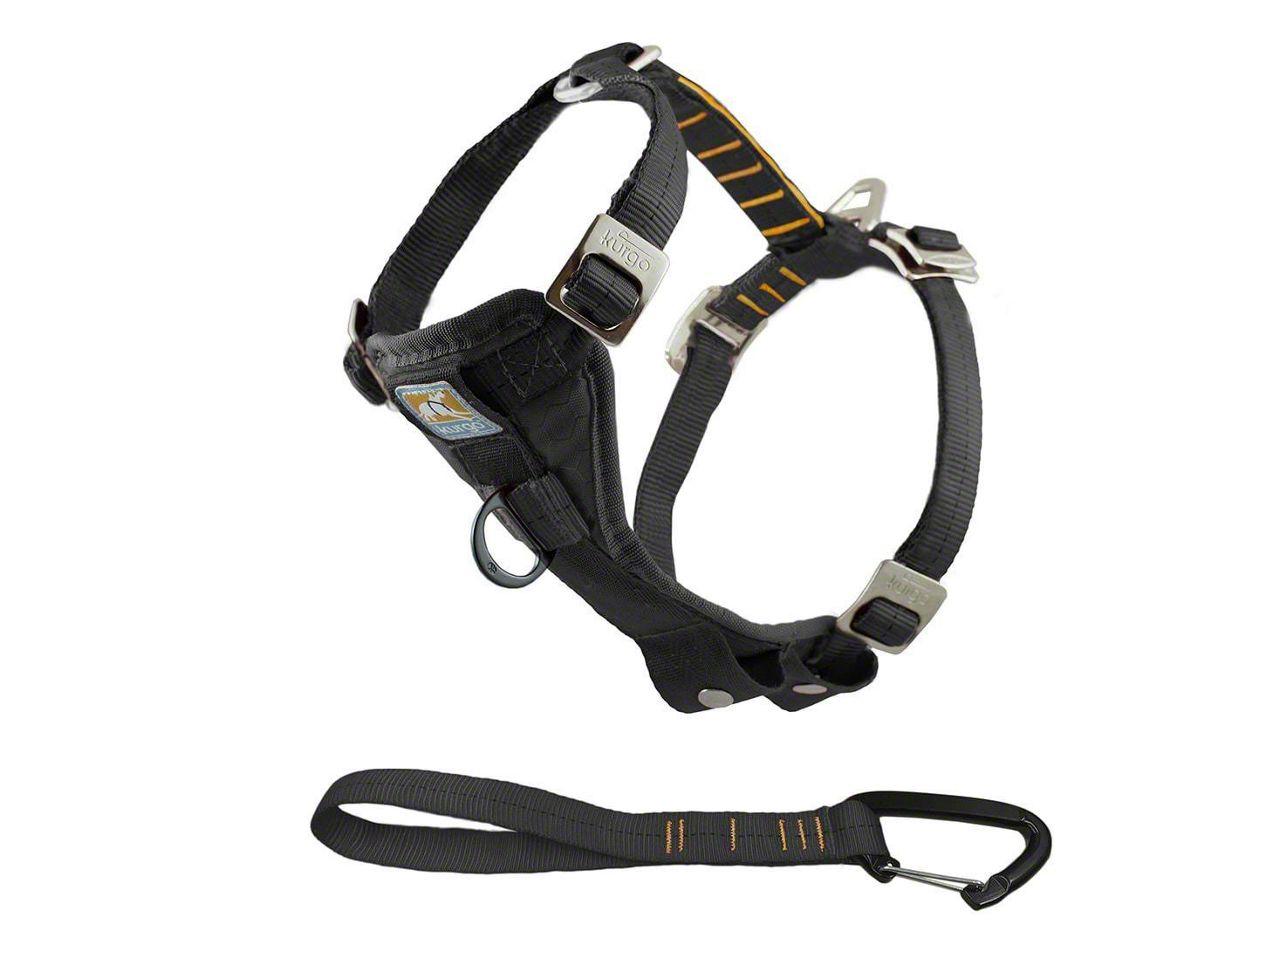 Kurgo Enhanced Strength TruFit Dog Car Harness - Black (02-19 RAM 1500)